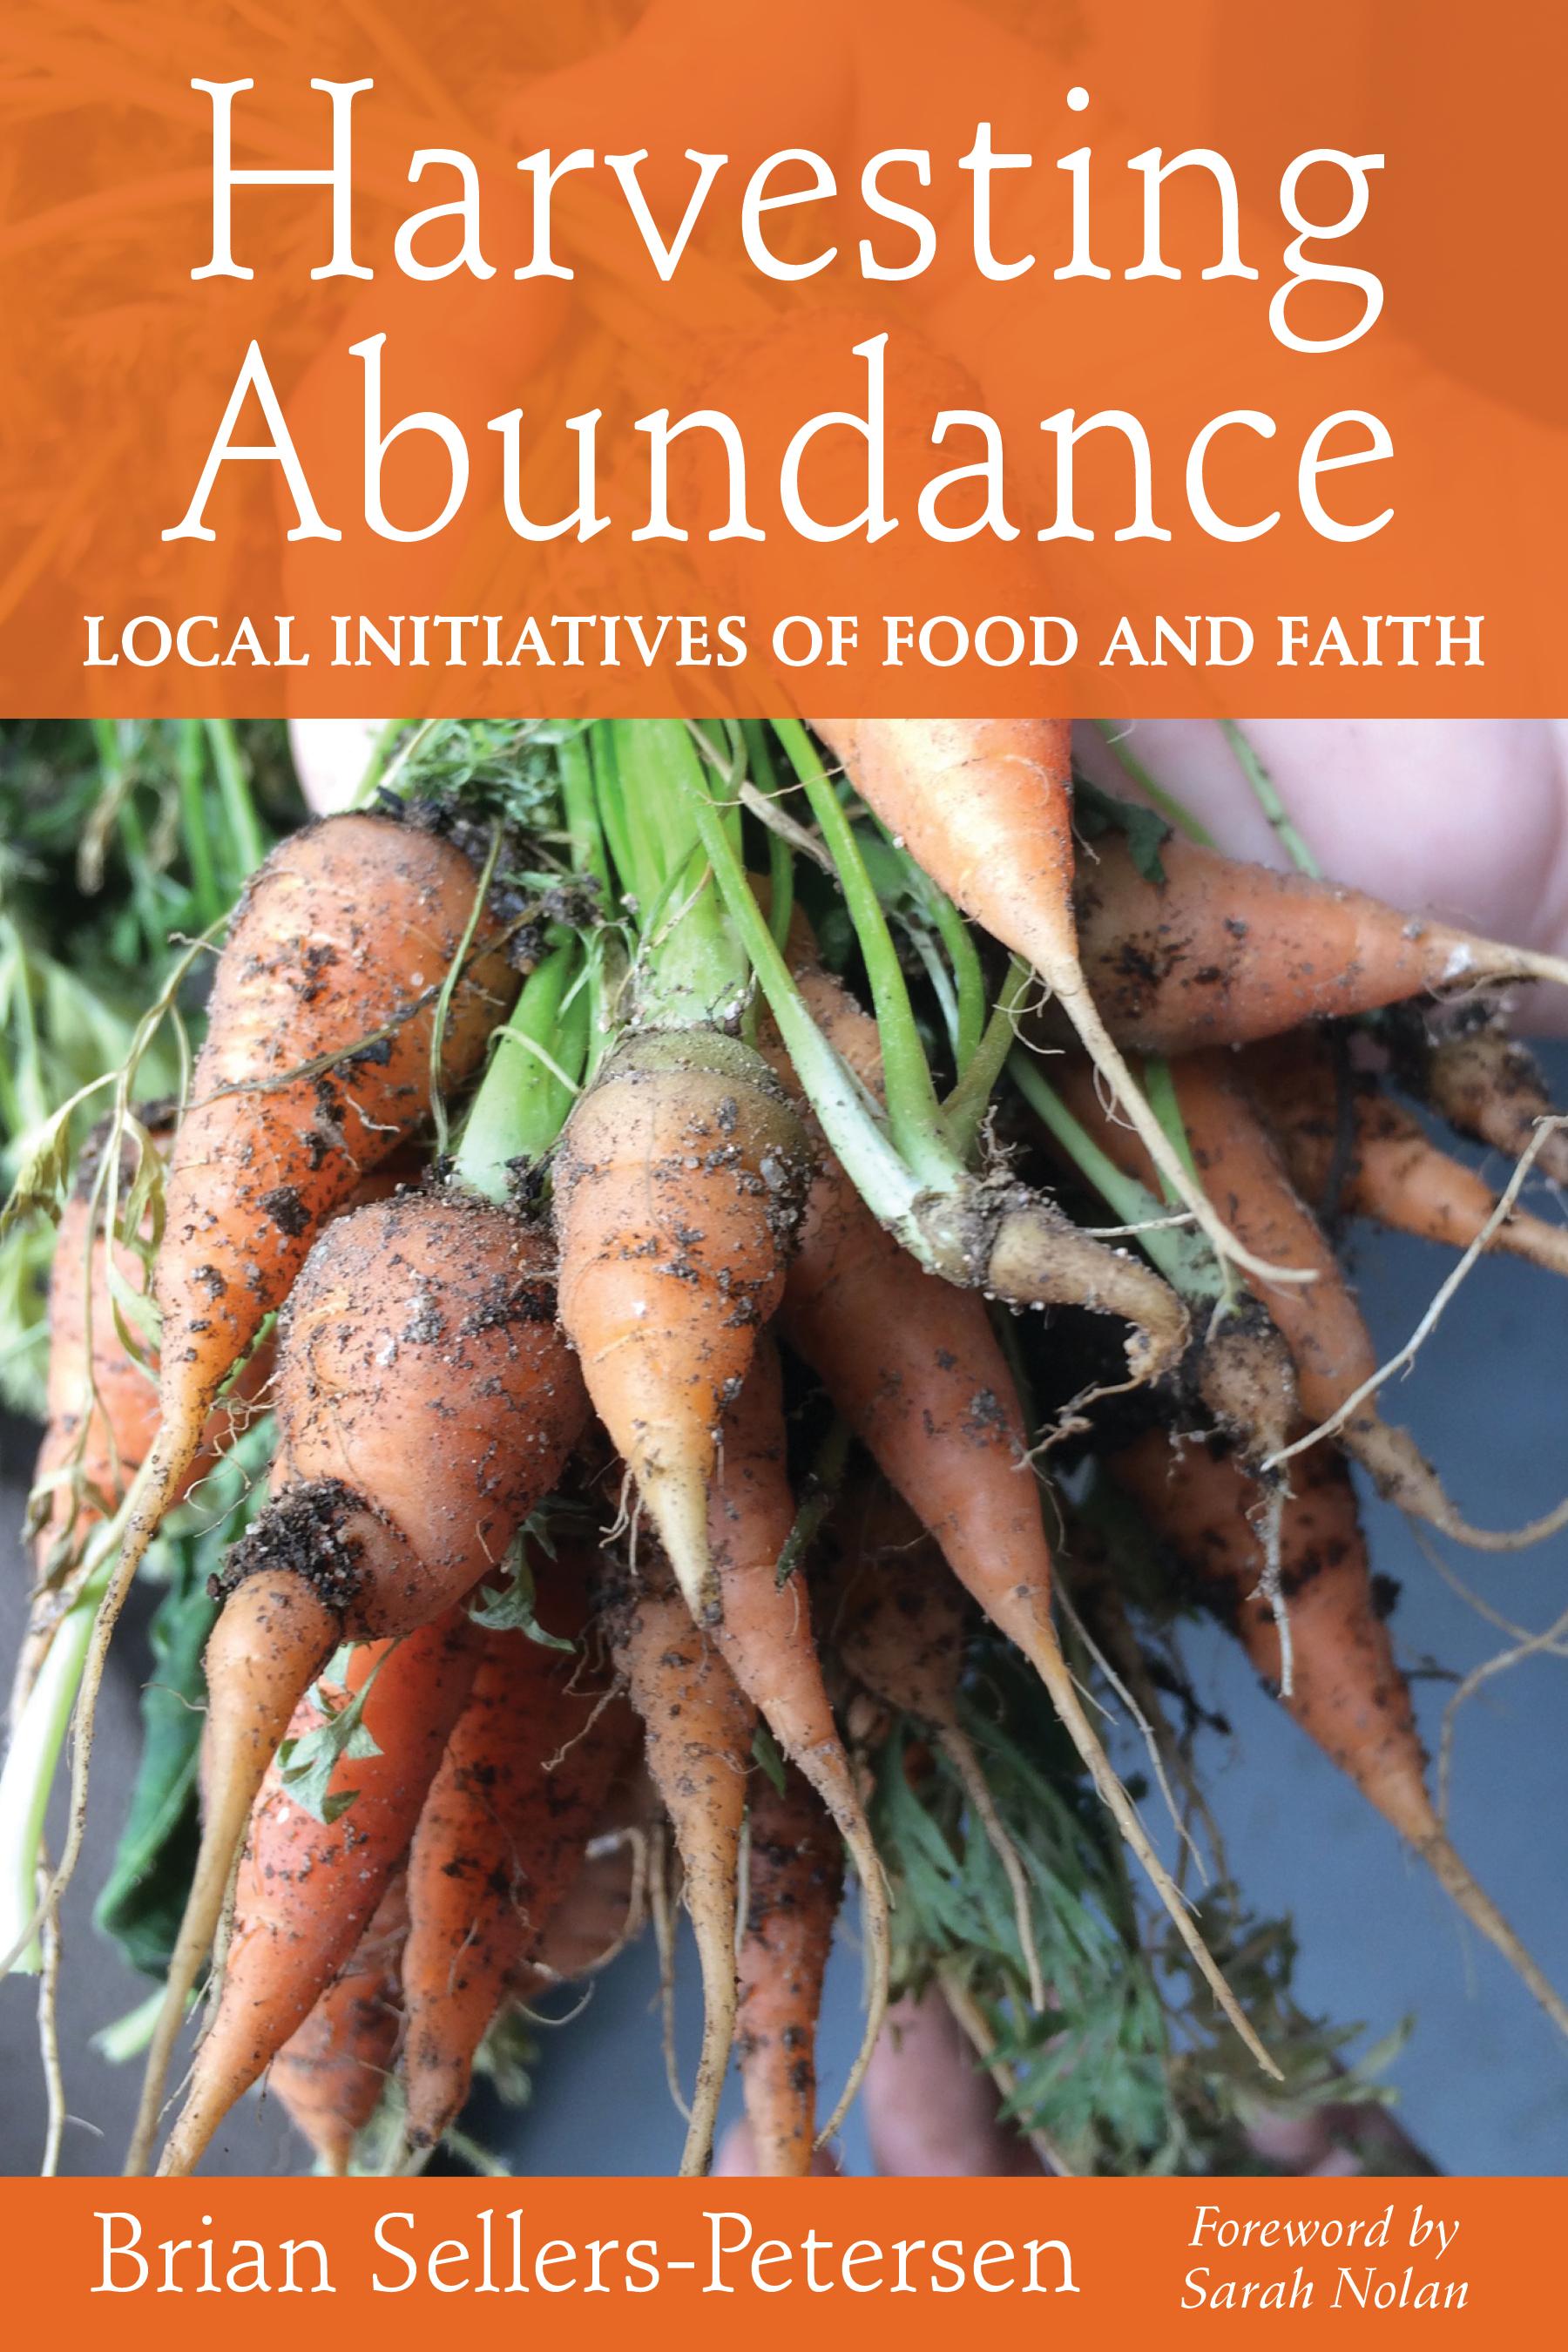 ChurchPublishing org: Harvesting Abundance